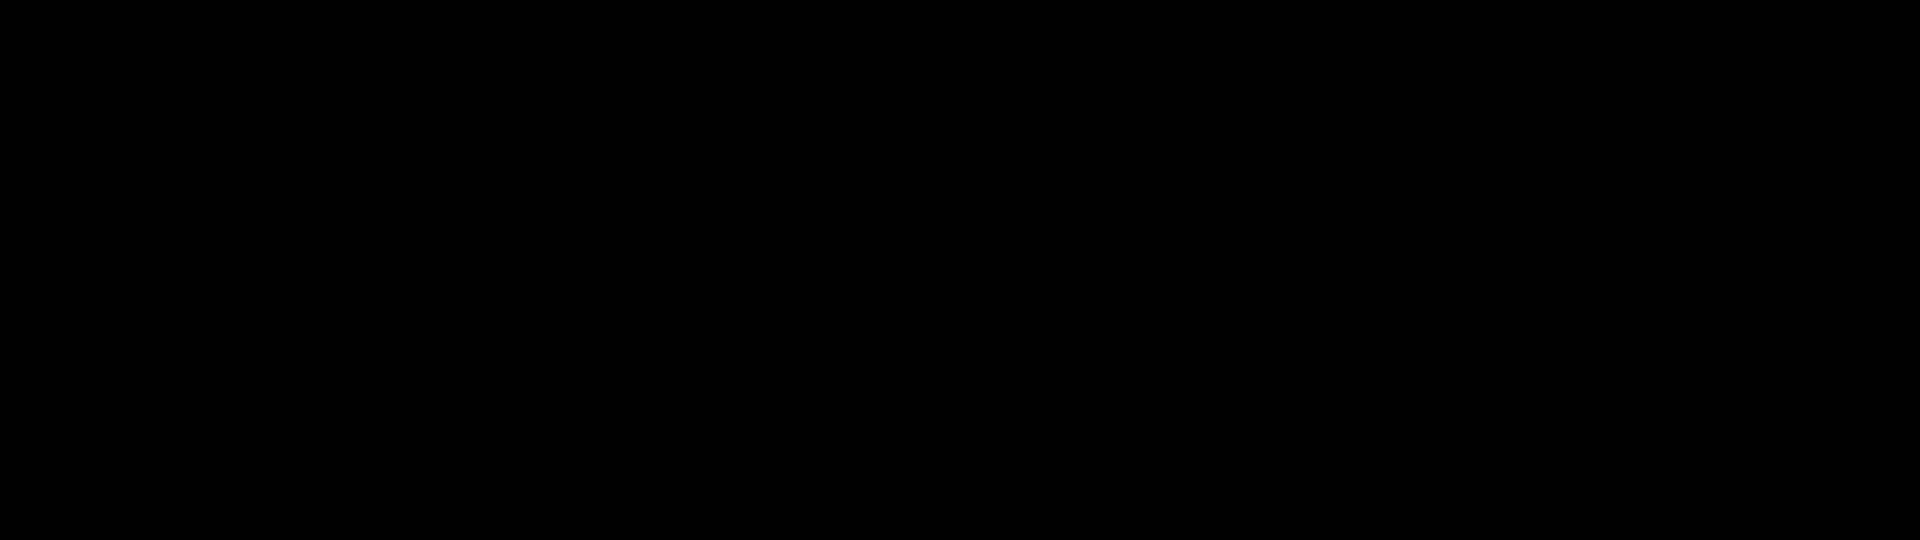 Type specimen that says 'Hand letters | Acherus''